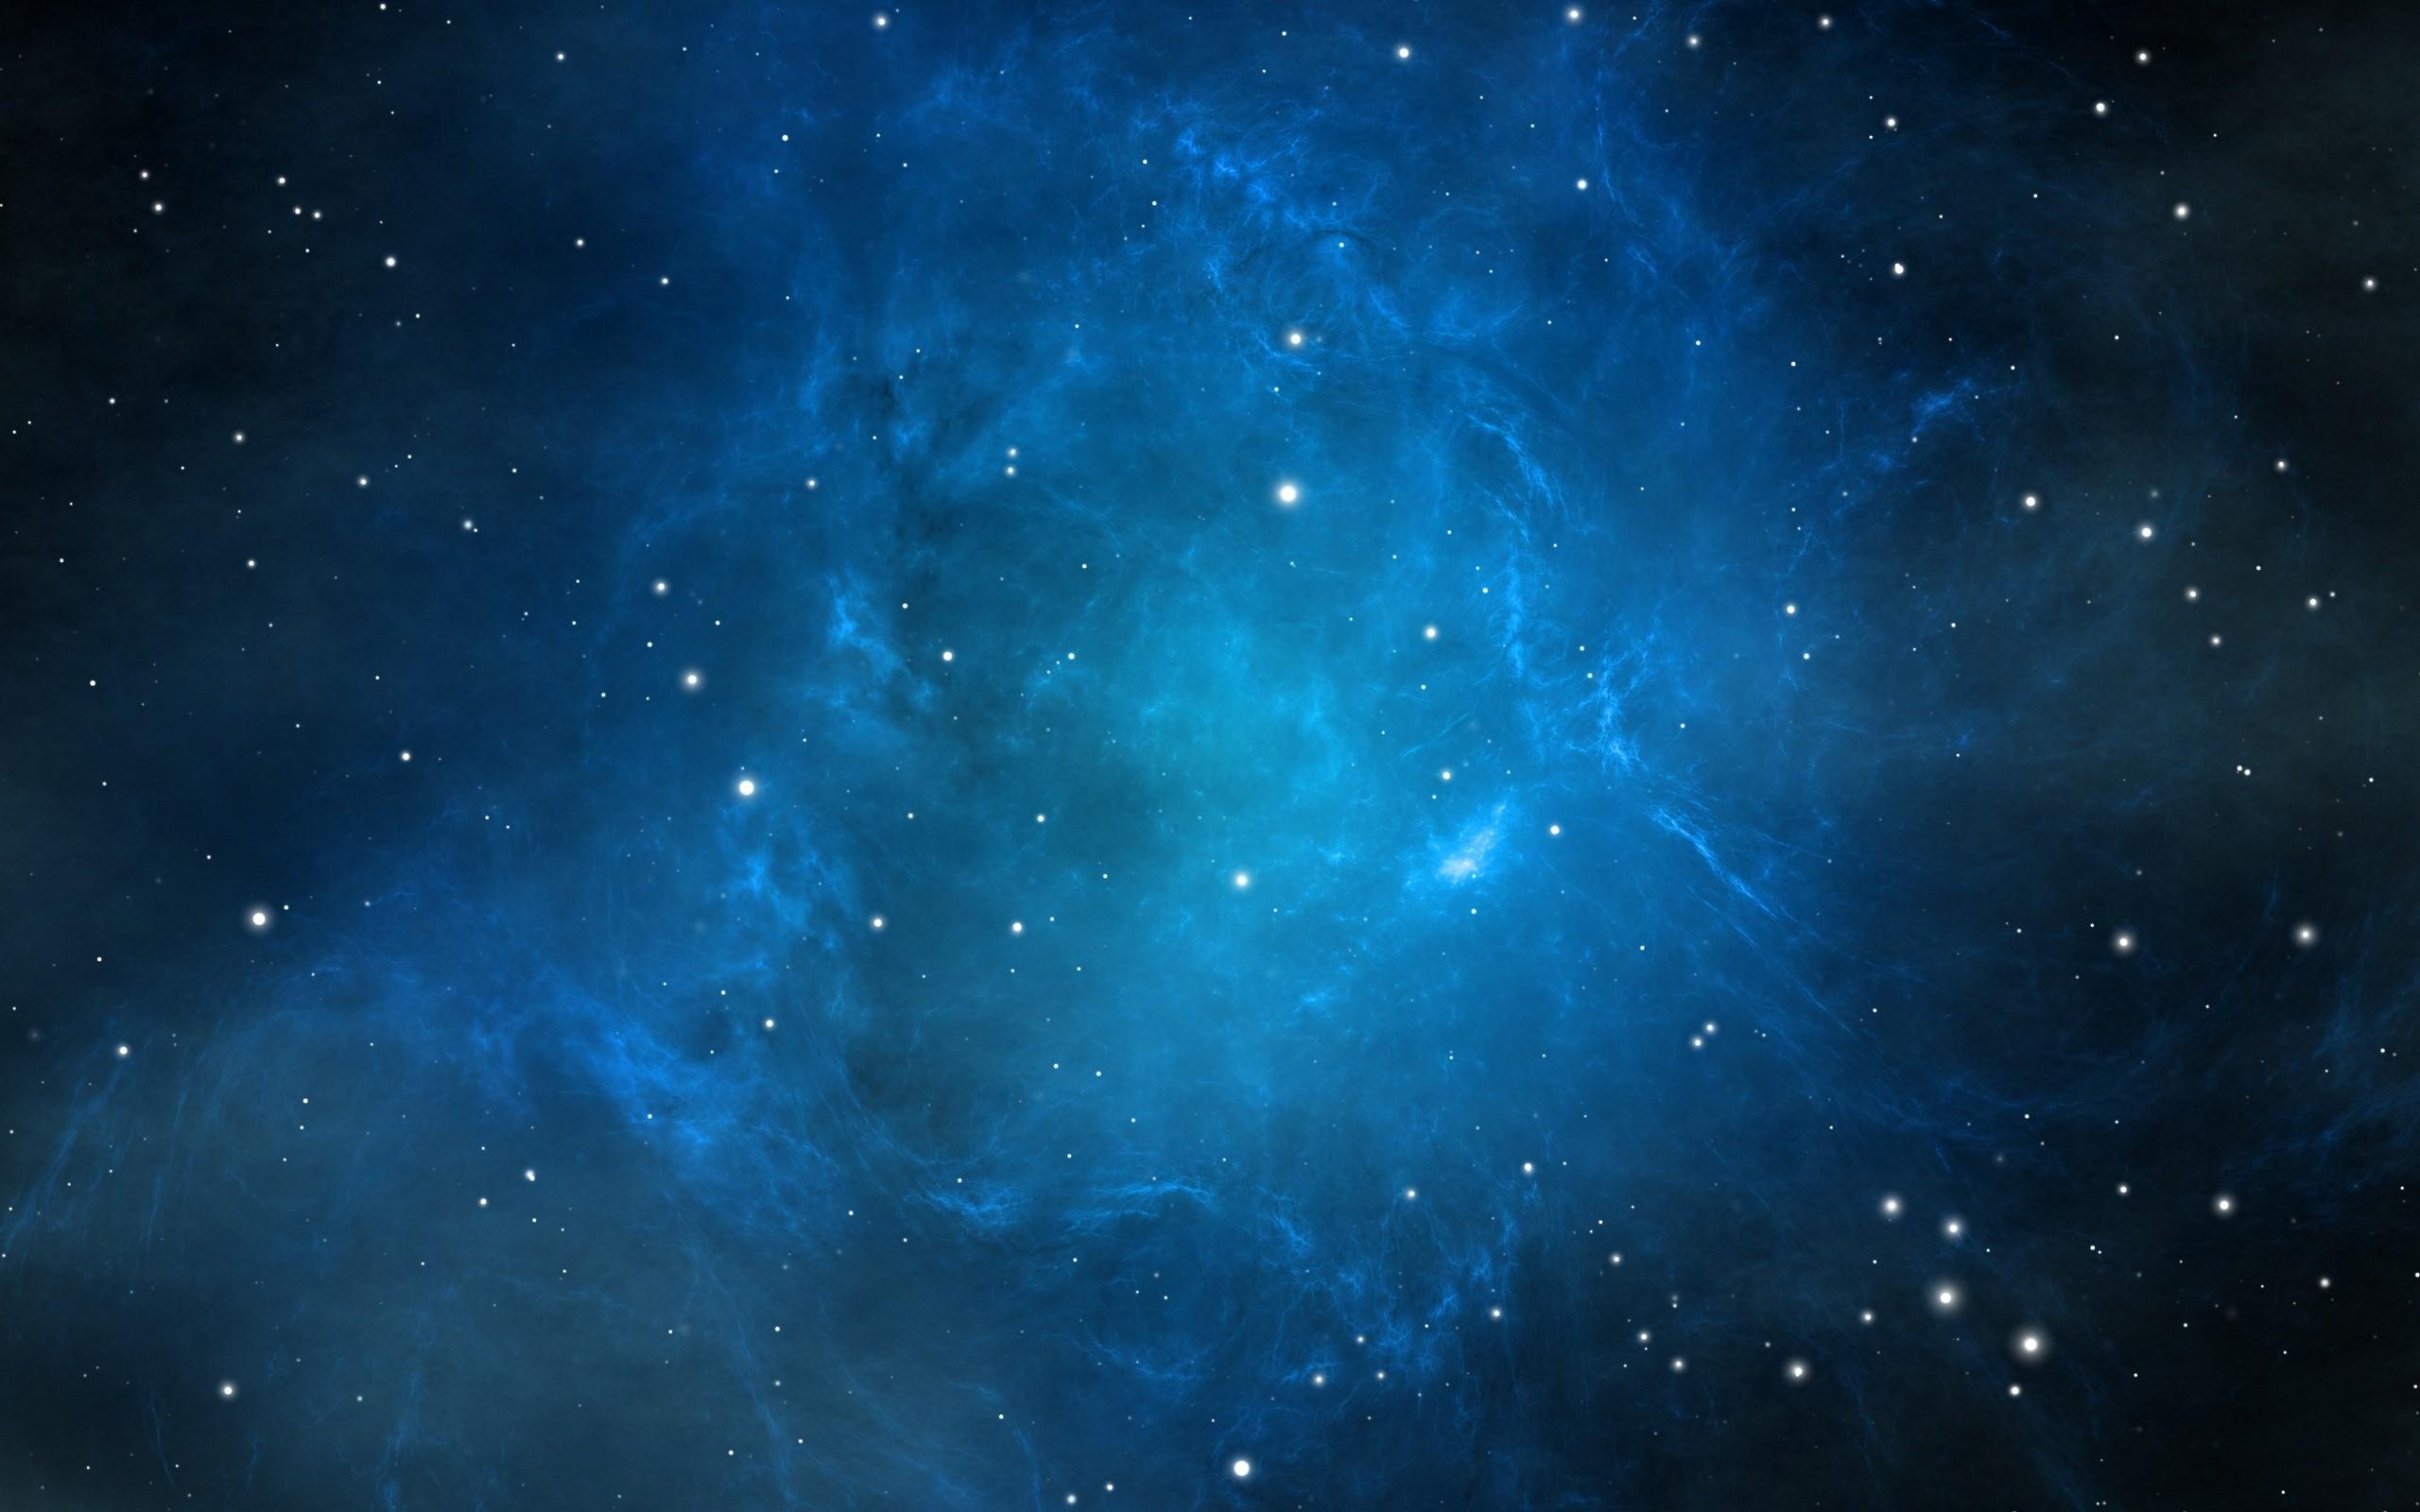 Black-Stars-Wallpaper-HD-Download.jpg (2560×1600) | blastoff | Pinterest |  Wallpaper and Digital art